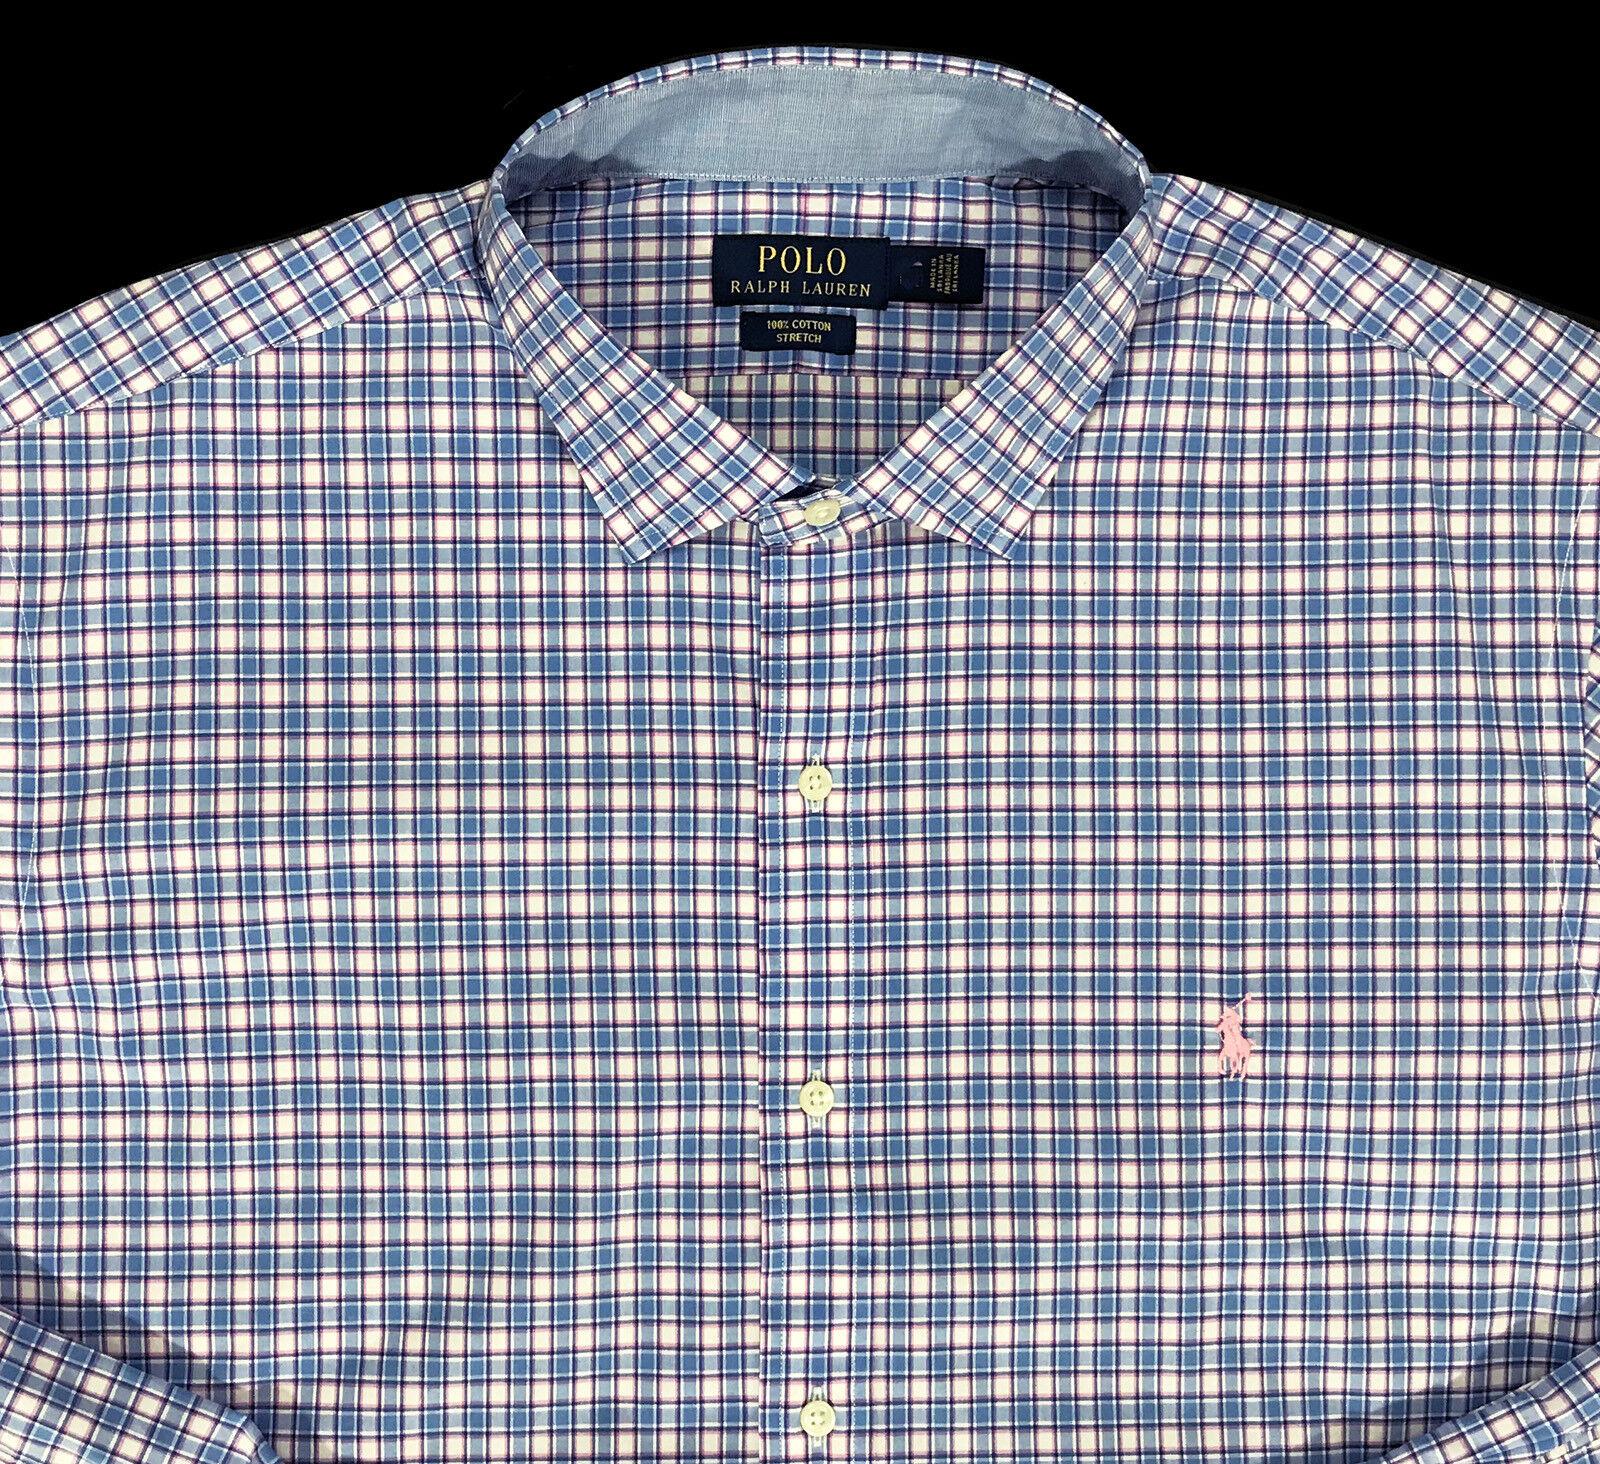 Men's RALPH LAUREN bluee Pink White Shirt Cotton Stretch 2XB 2X 2XL BIG NWT NEW